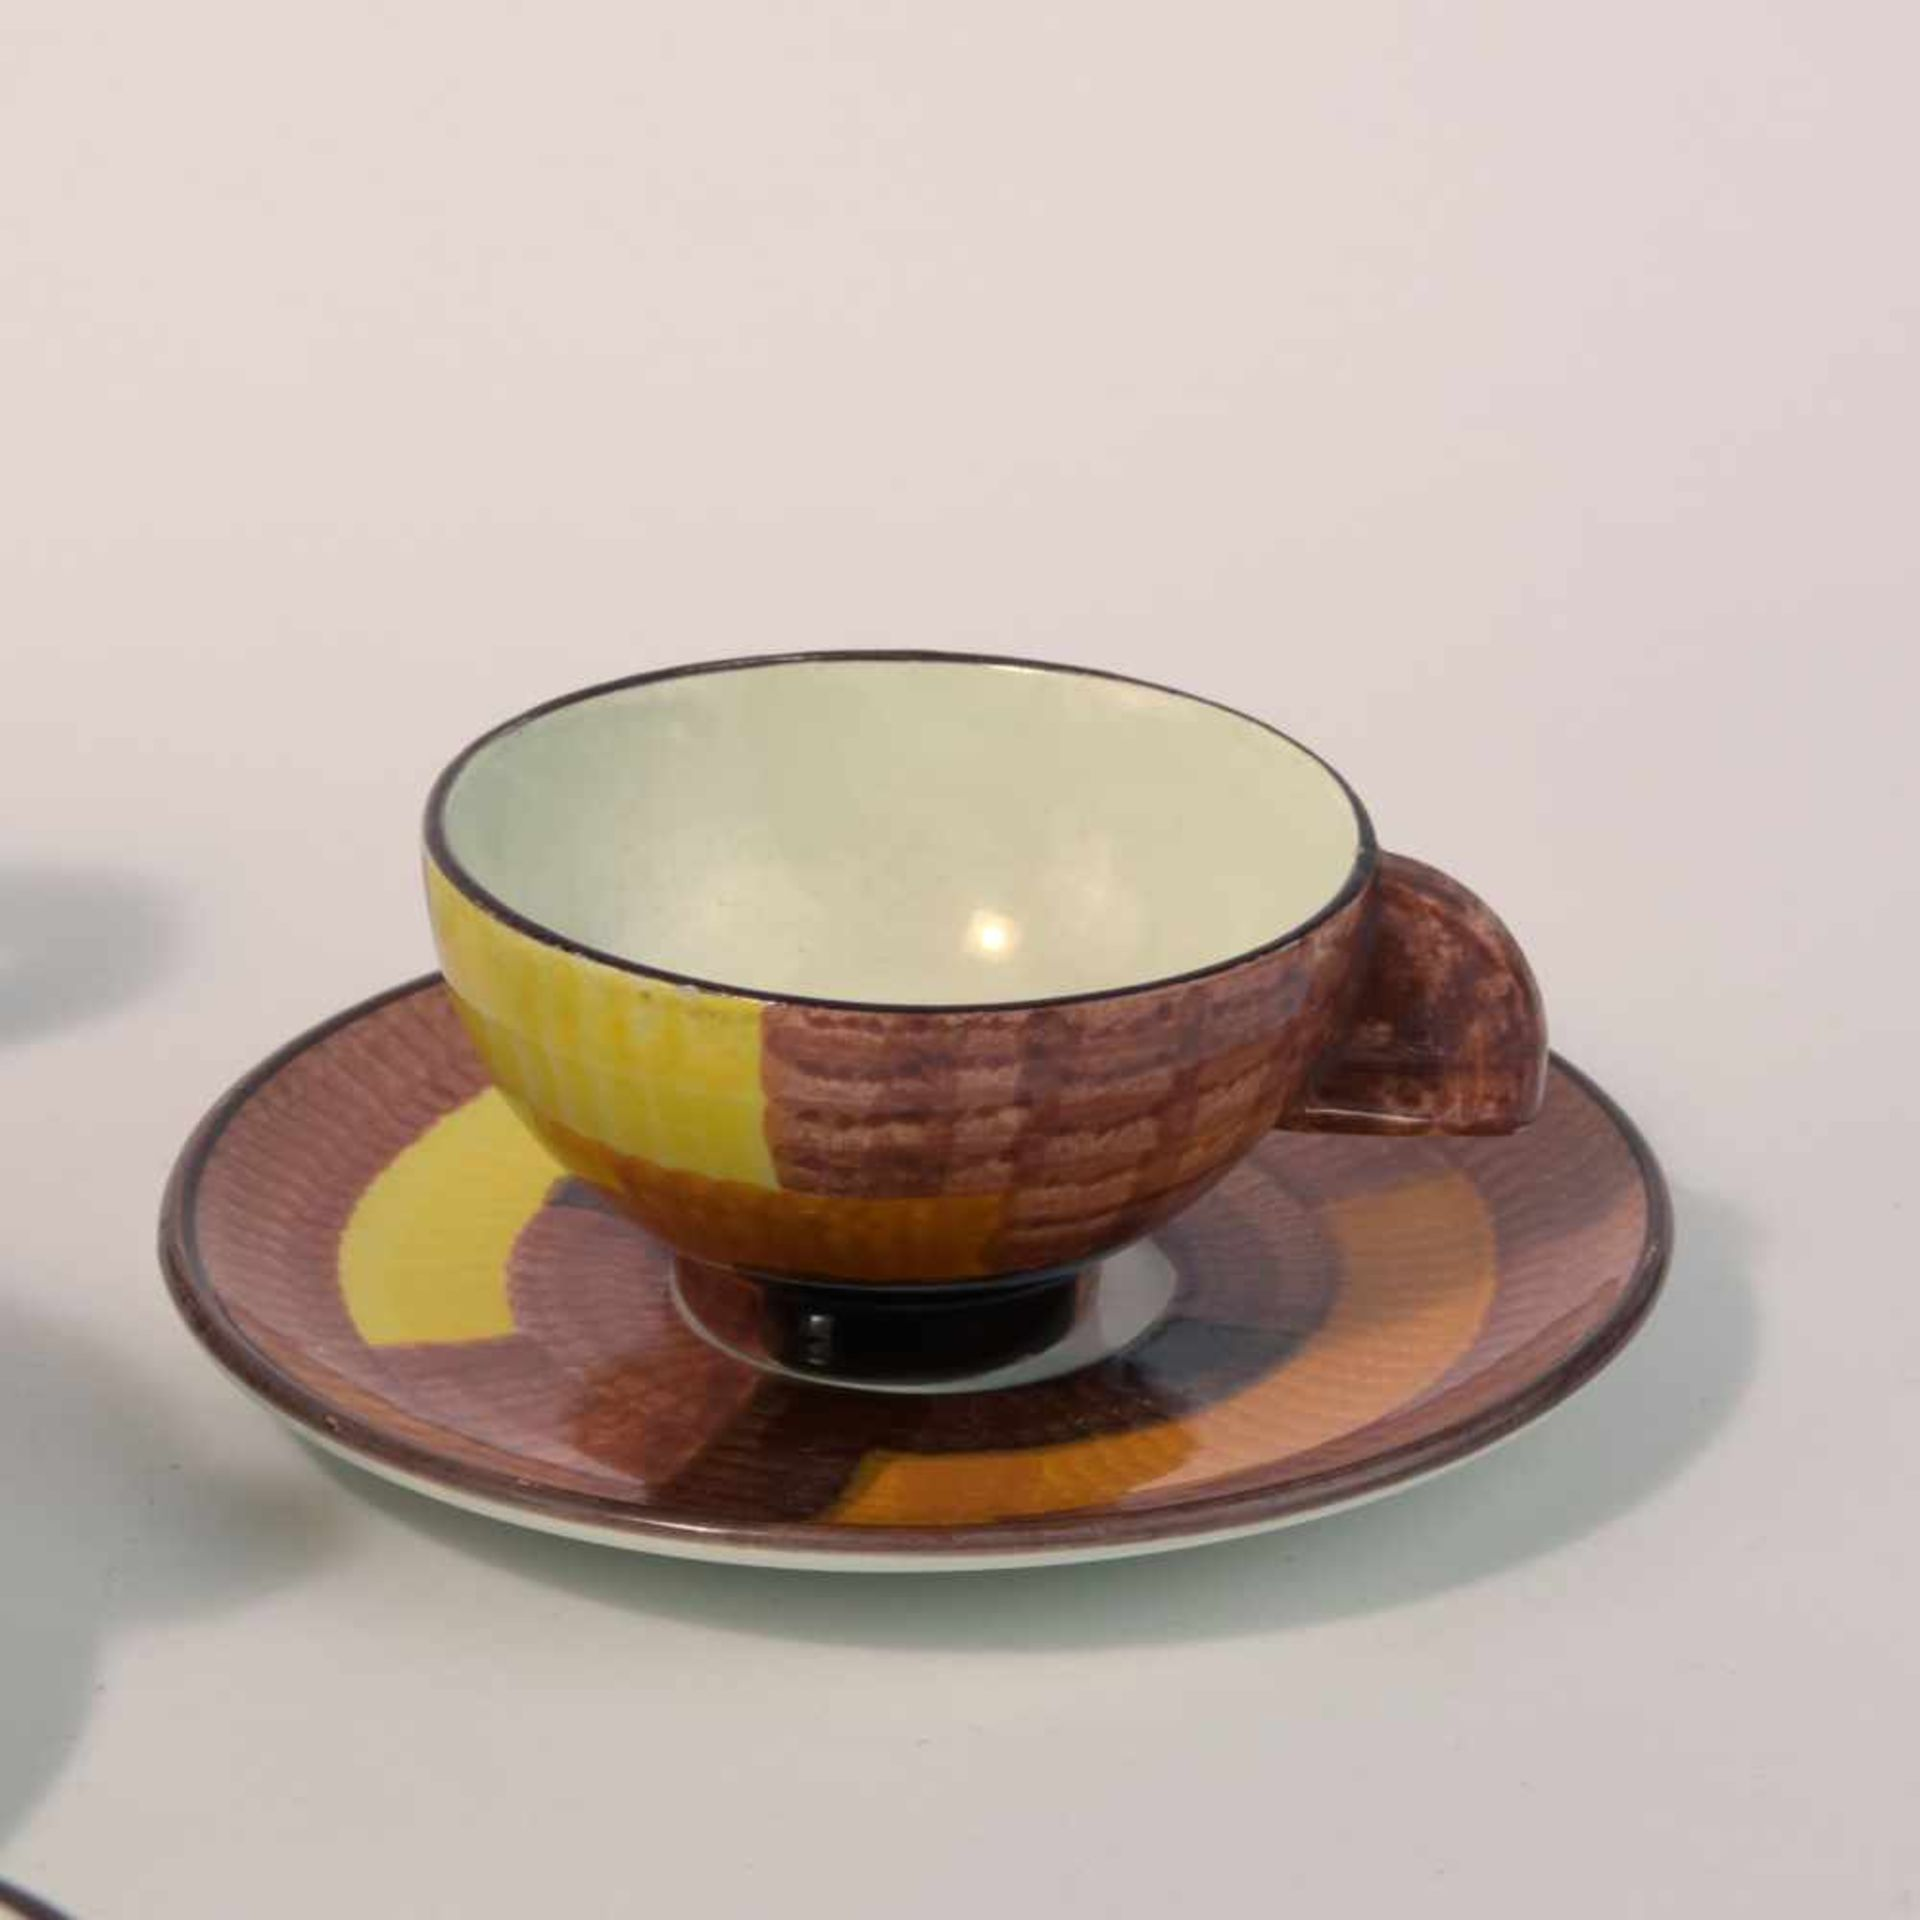 Los 20 - Eva Zeisel-Stricker Teeservice, 1928 Neun Teile. Teekanne: H. 13 cm; Milchkanne: H. 6,7 cm;